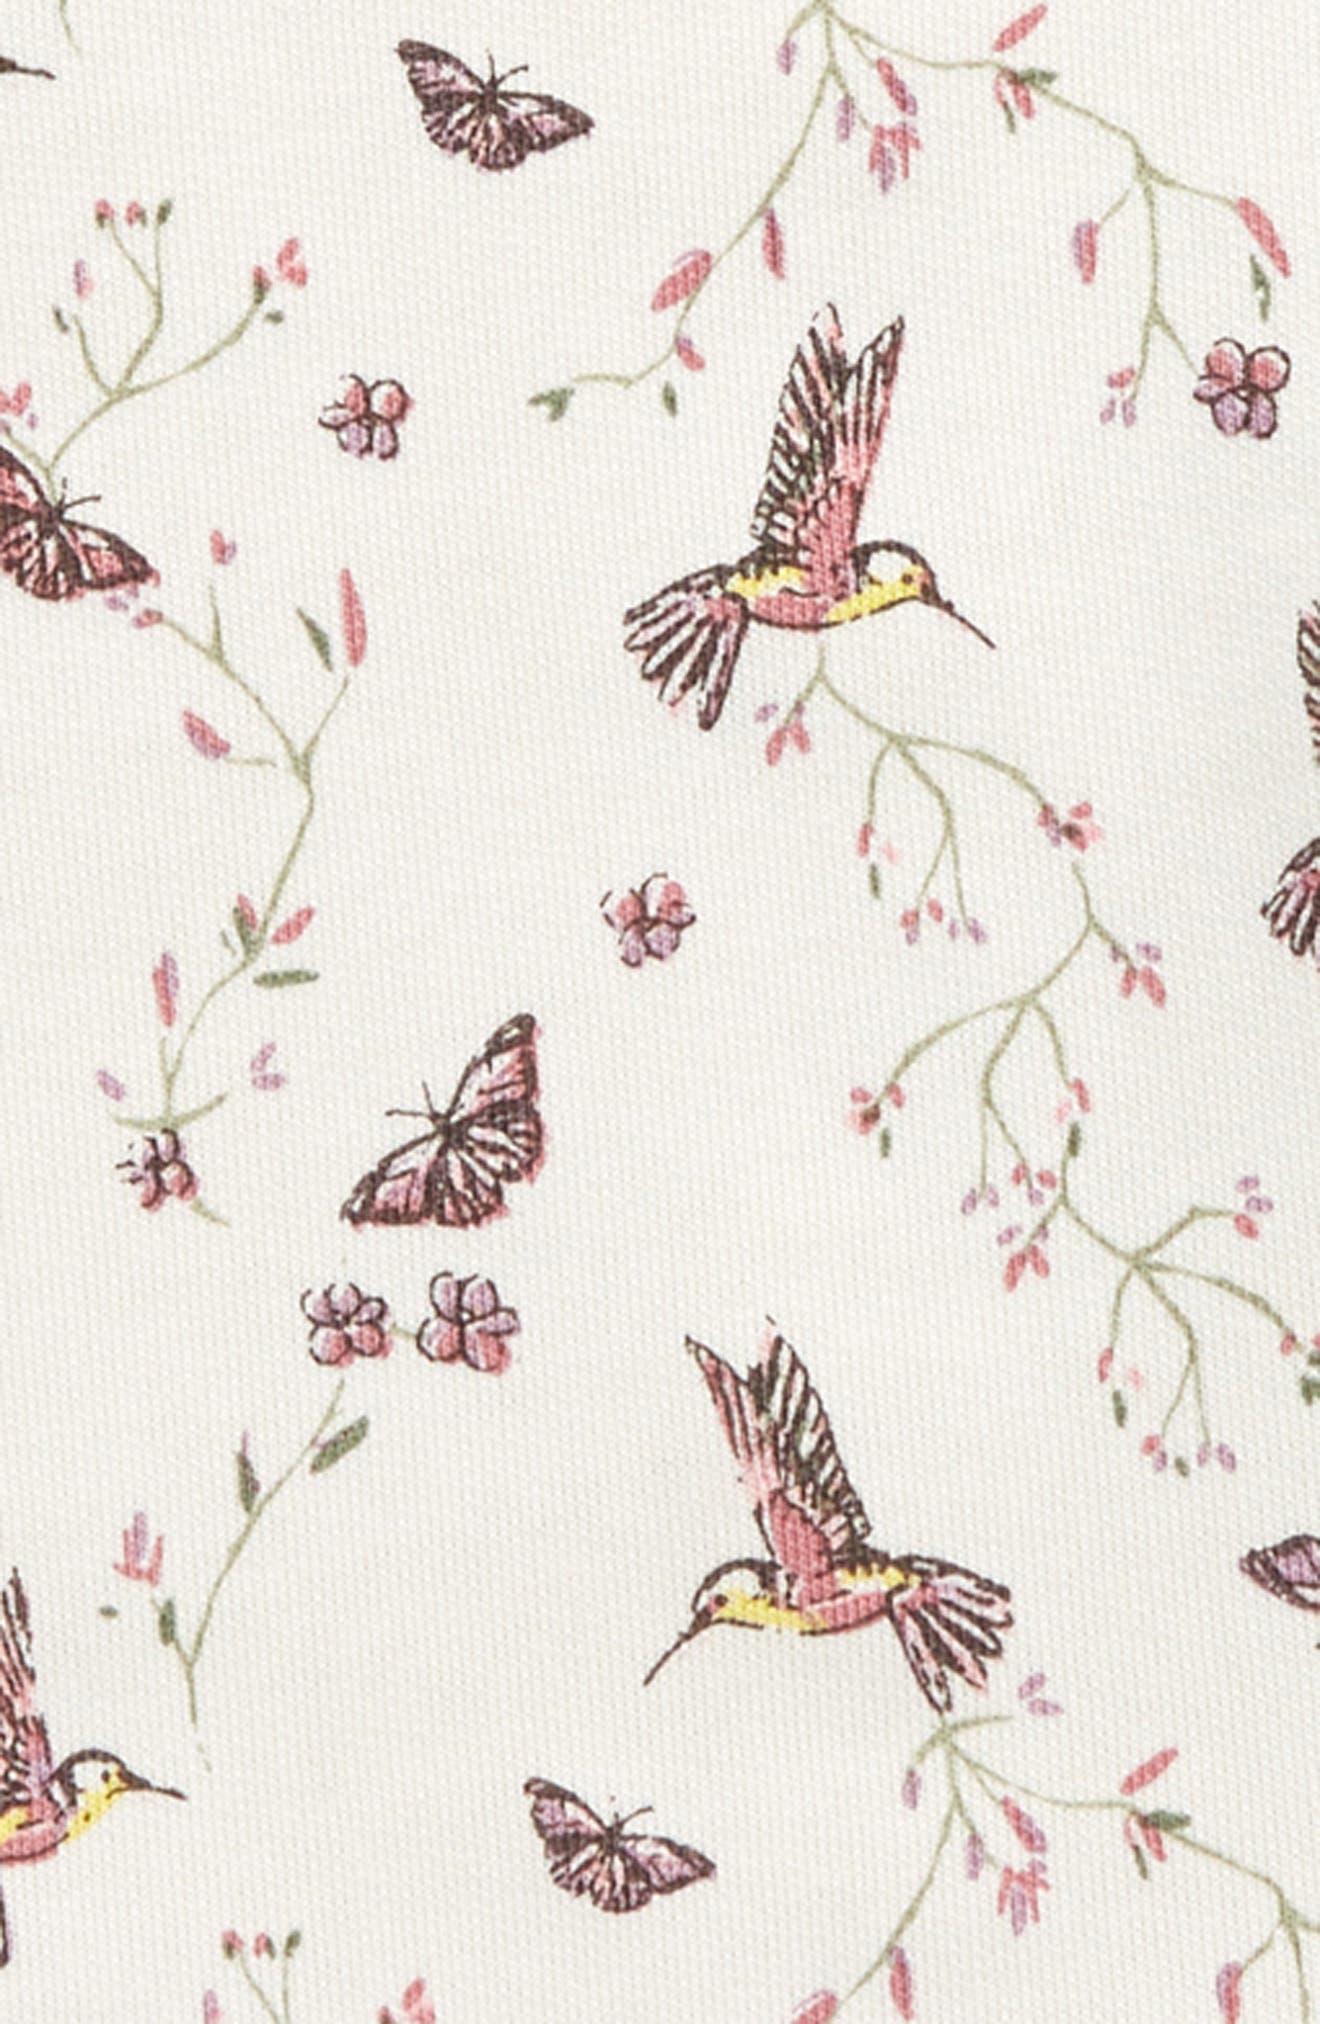 Hummingbird Sweatshirt,                             Alternate thumbnail 2, color,                             906